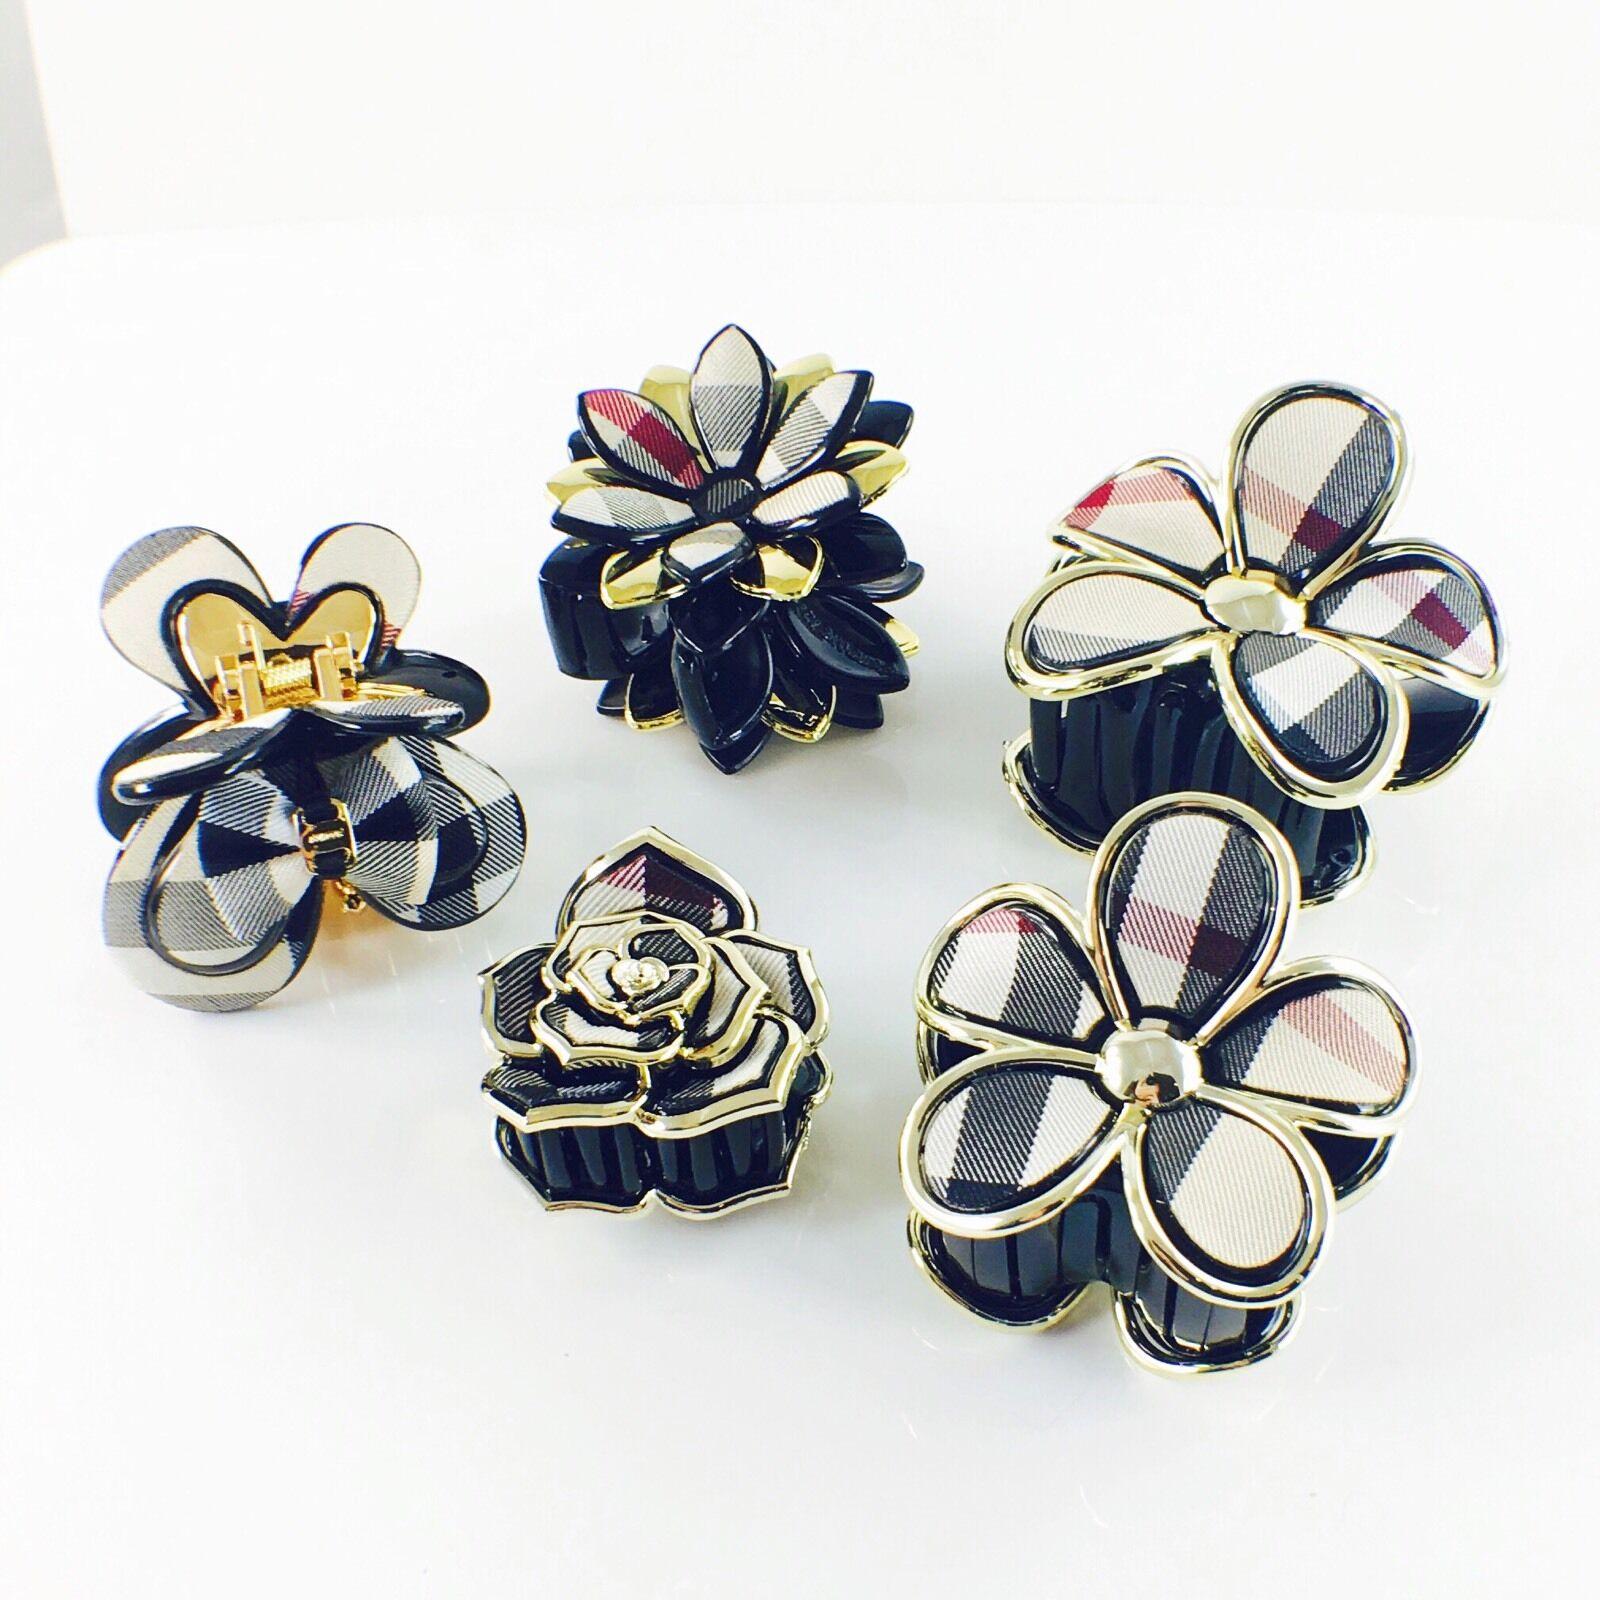 USA Quality Acrylic Fabric Hair Claw Clip Hairpin Handmade Flower Rose A05